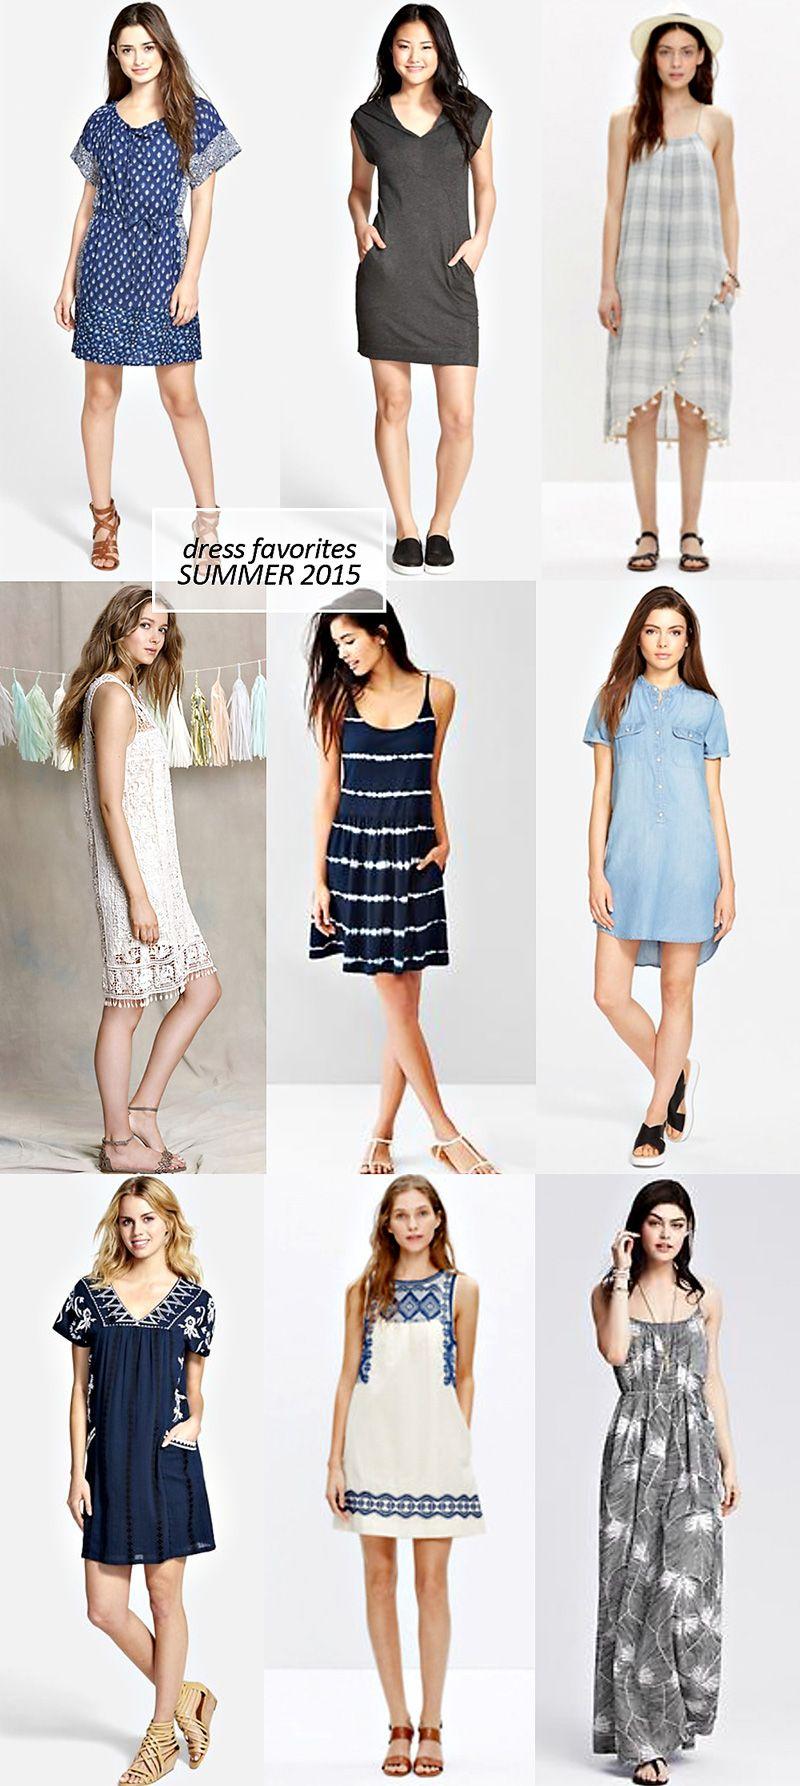 9 Summer Dress Favorites | PepperDesignBlog.com